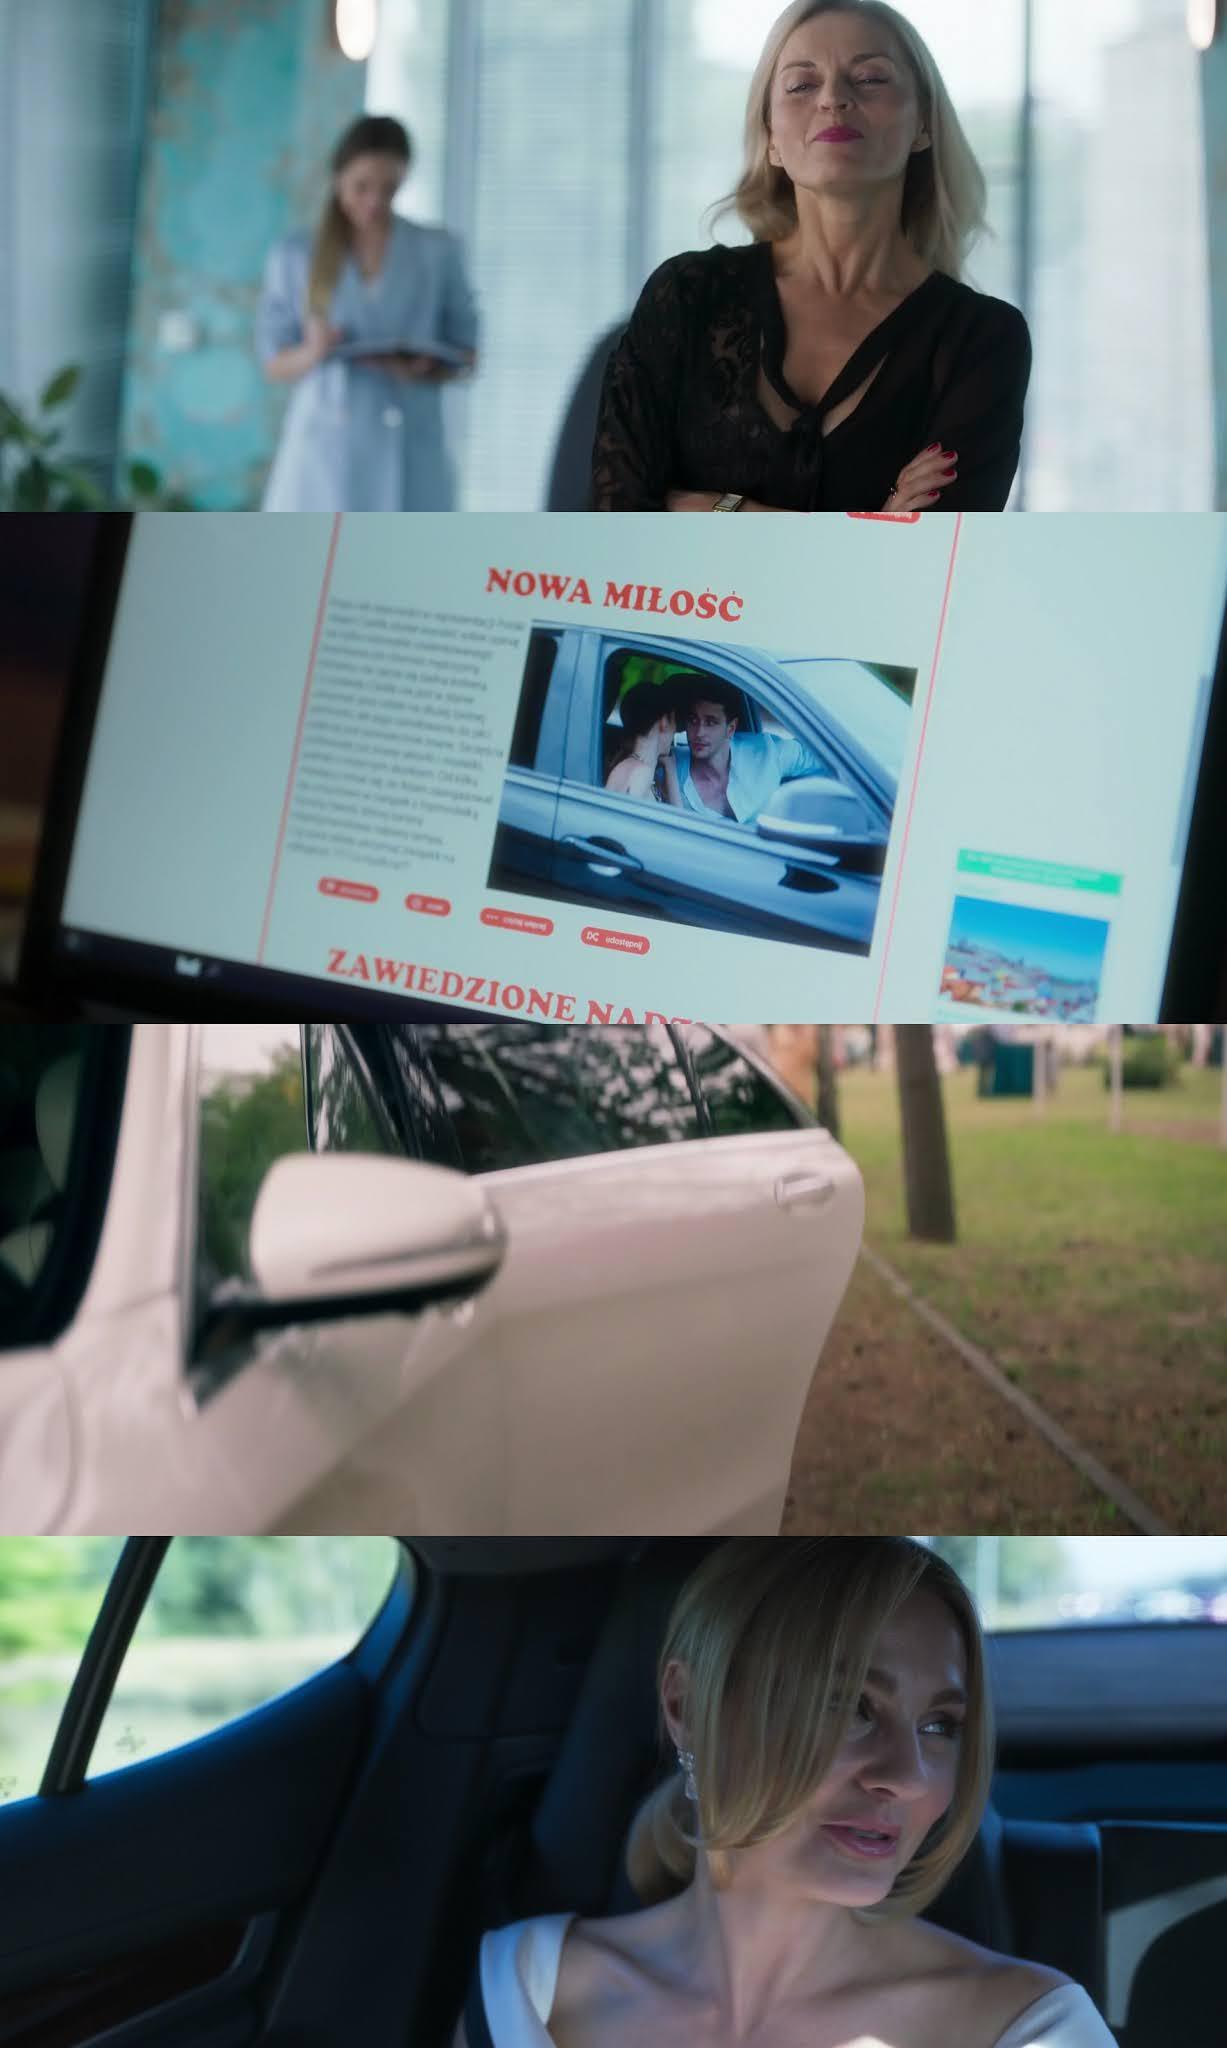 Como Casarse con un Millonario (2019) HD 1080p Latino